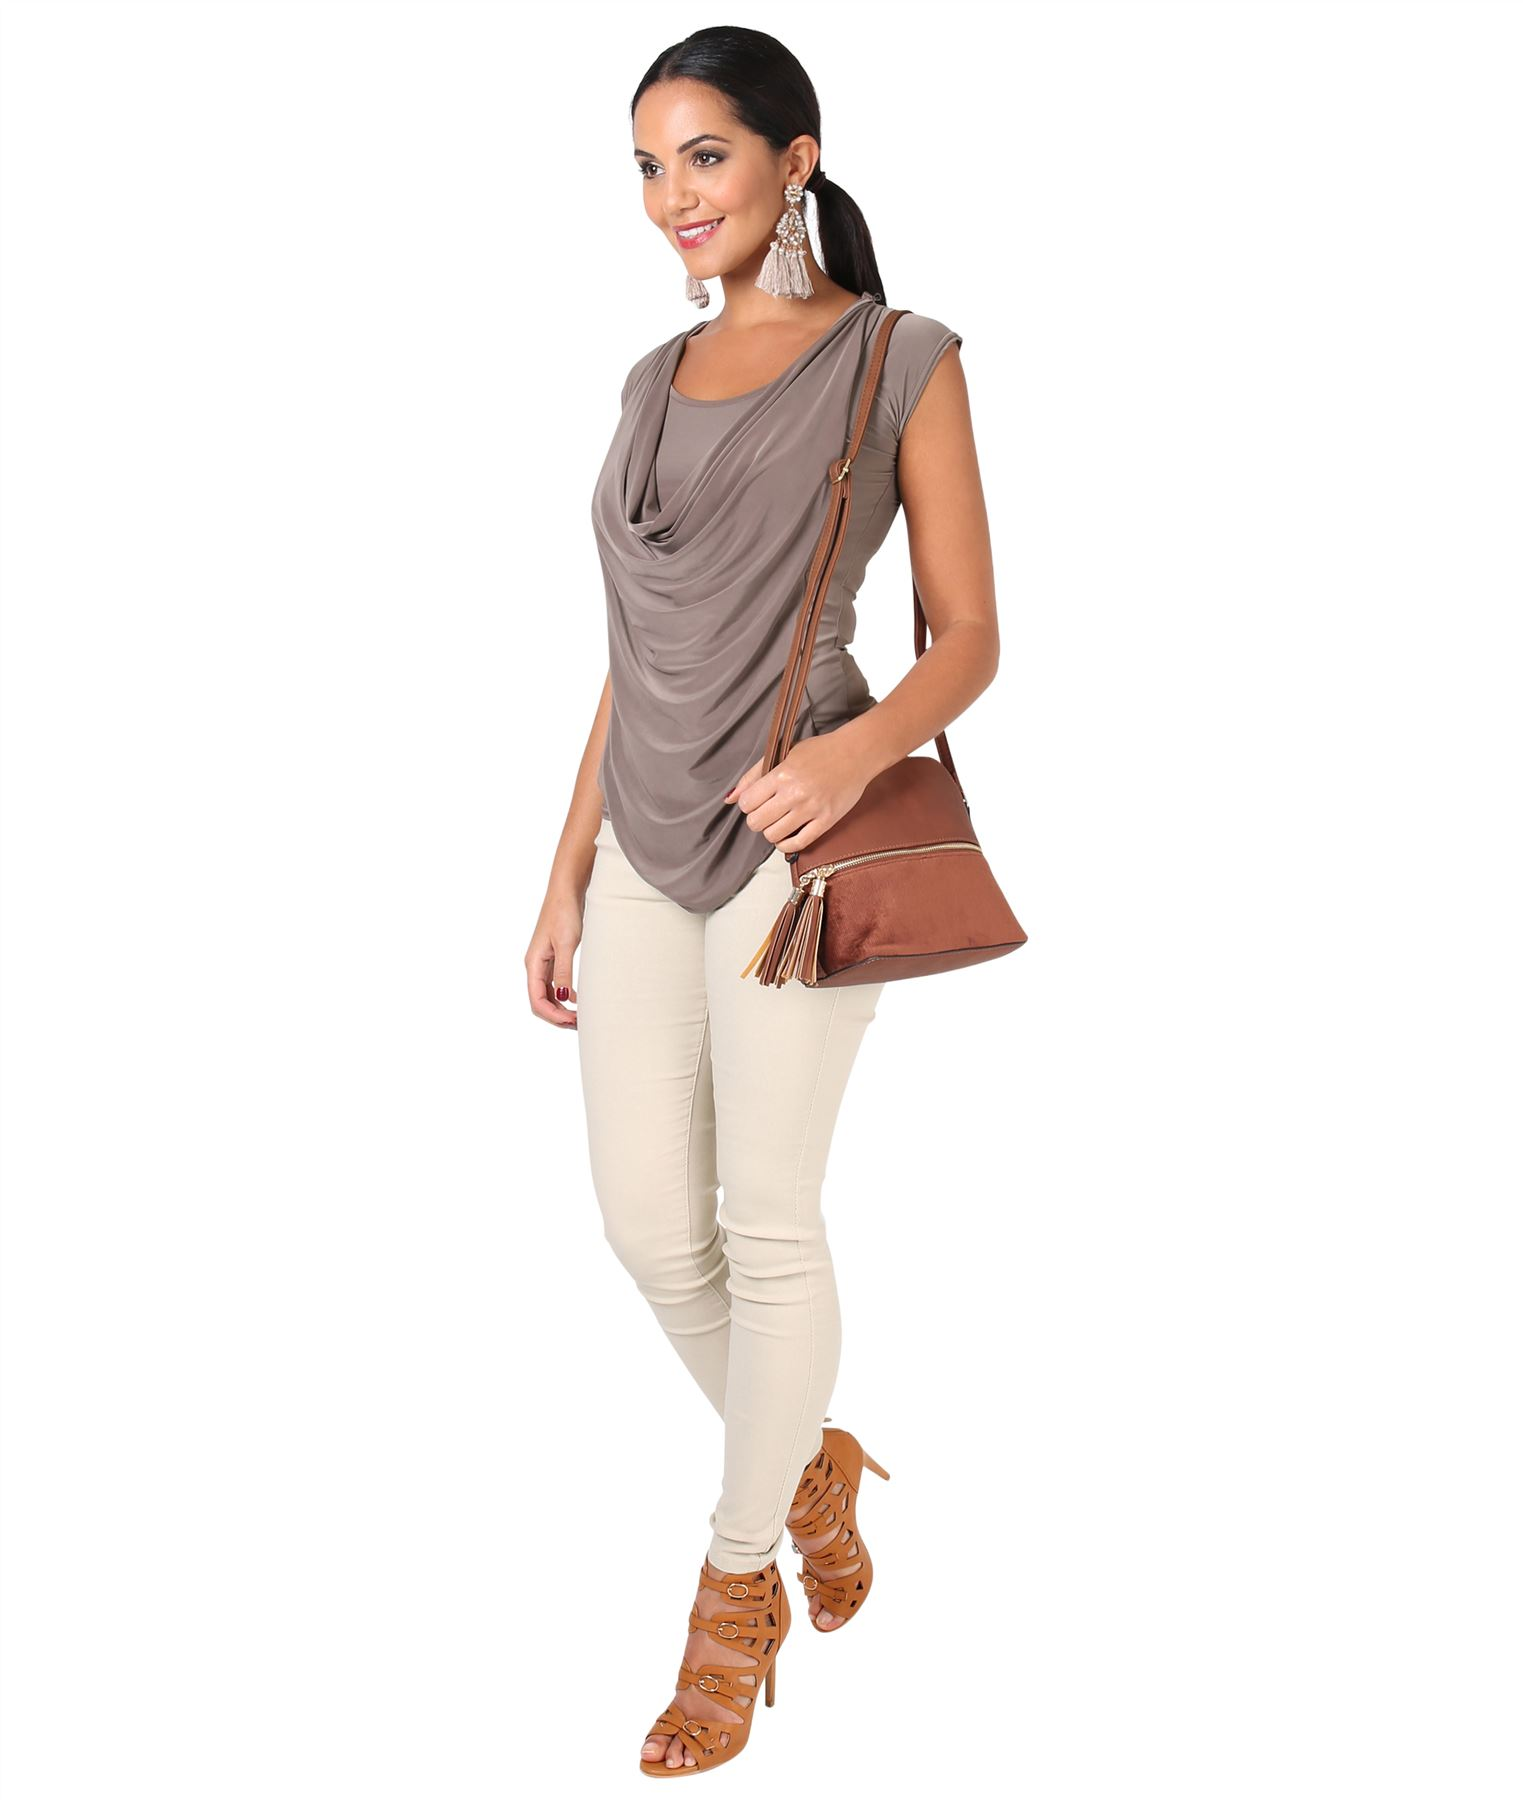 Womens-Ladies-Cowl-Neck-Top-Sleeveless-Silk-Drape-T-Shirt-Low-Cut-Back-Party thumbnail 11